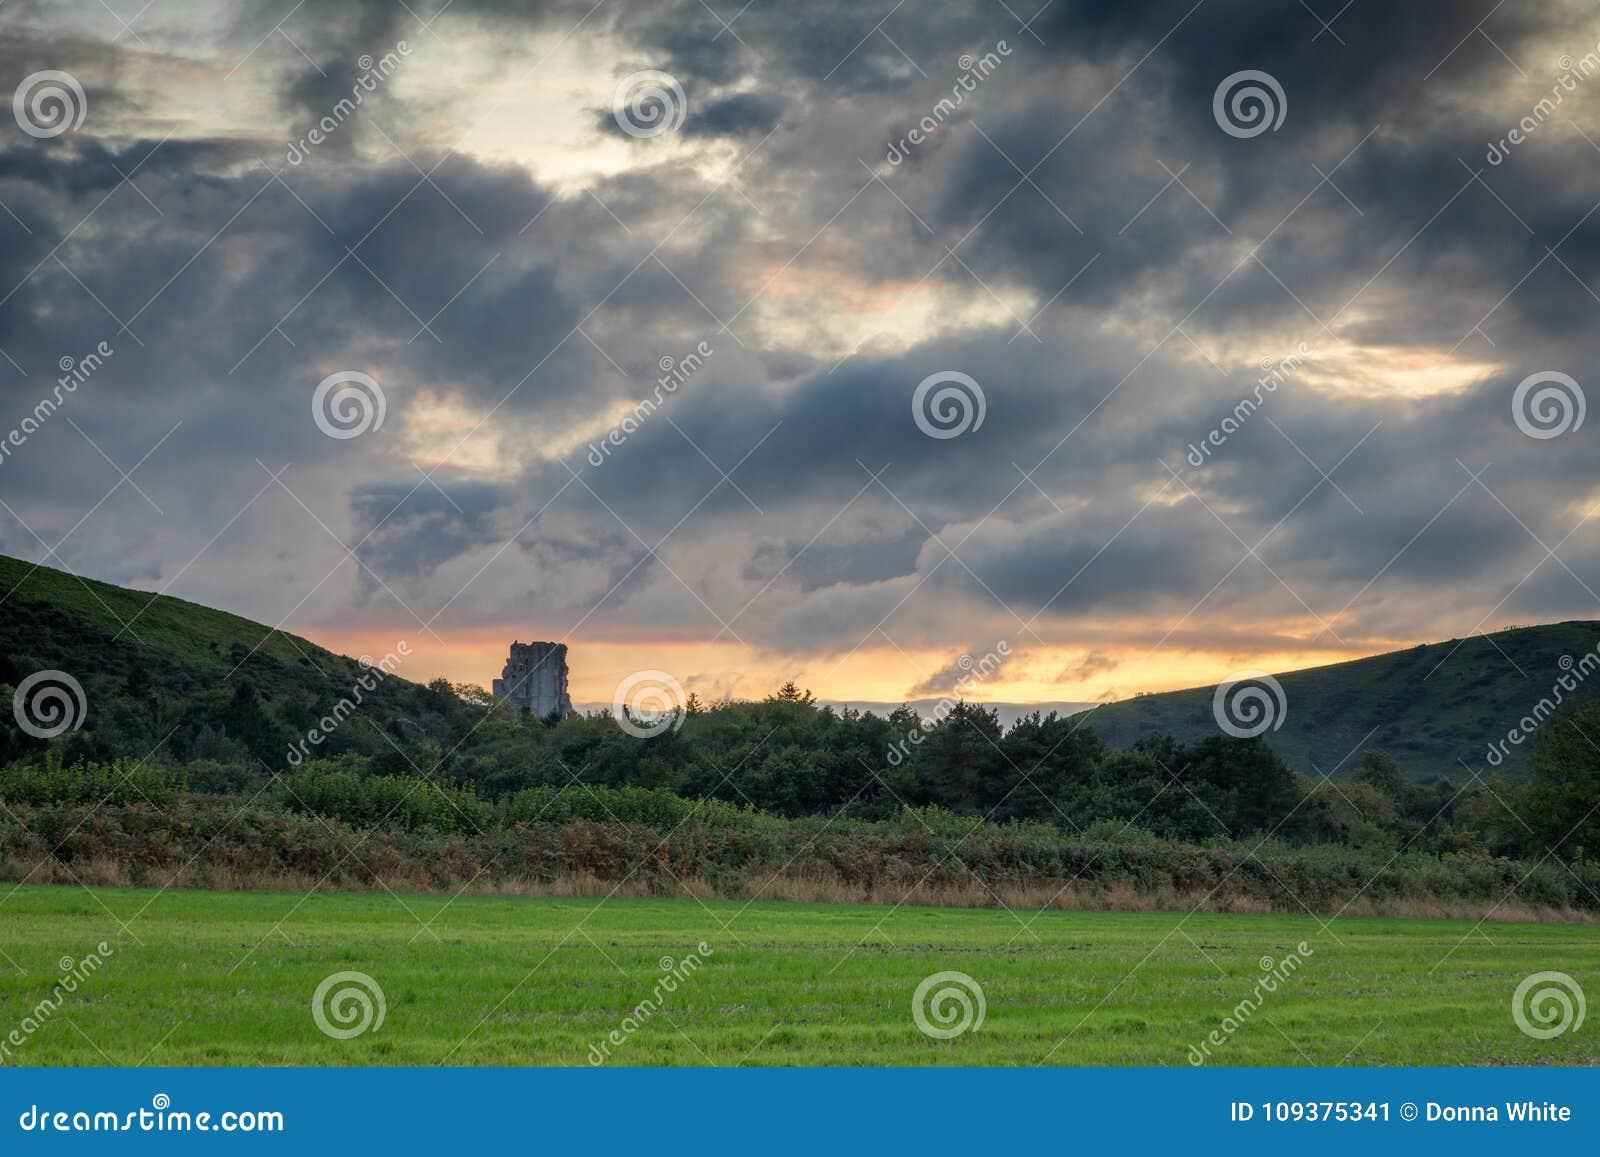 A Castle In The Clouds Gatlinburg Tn